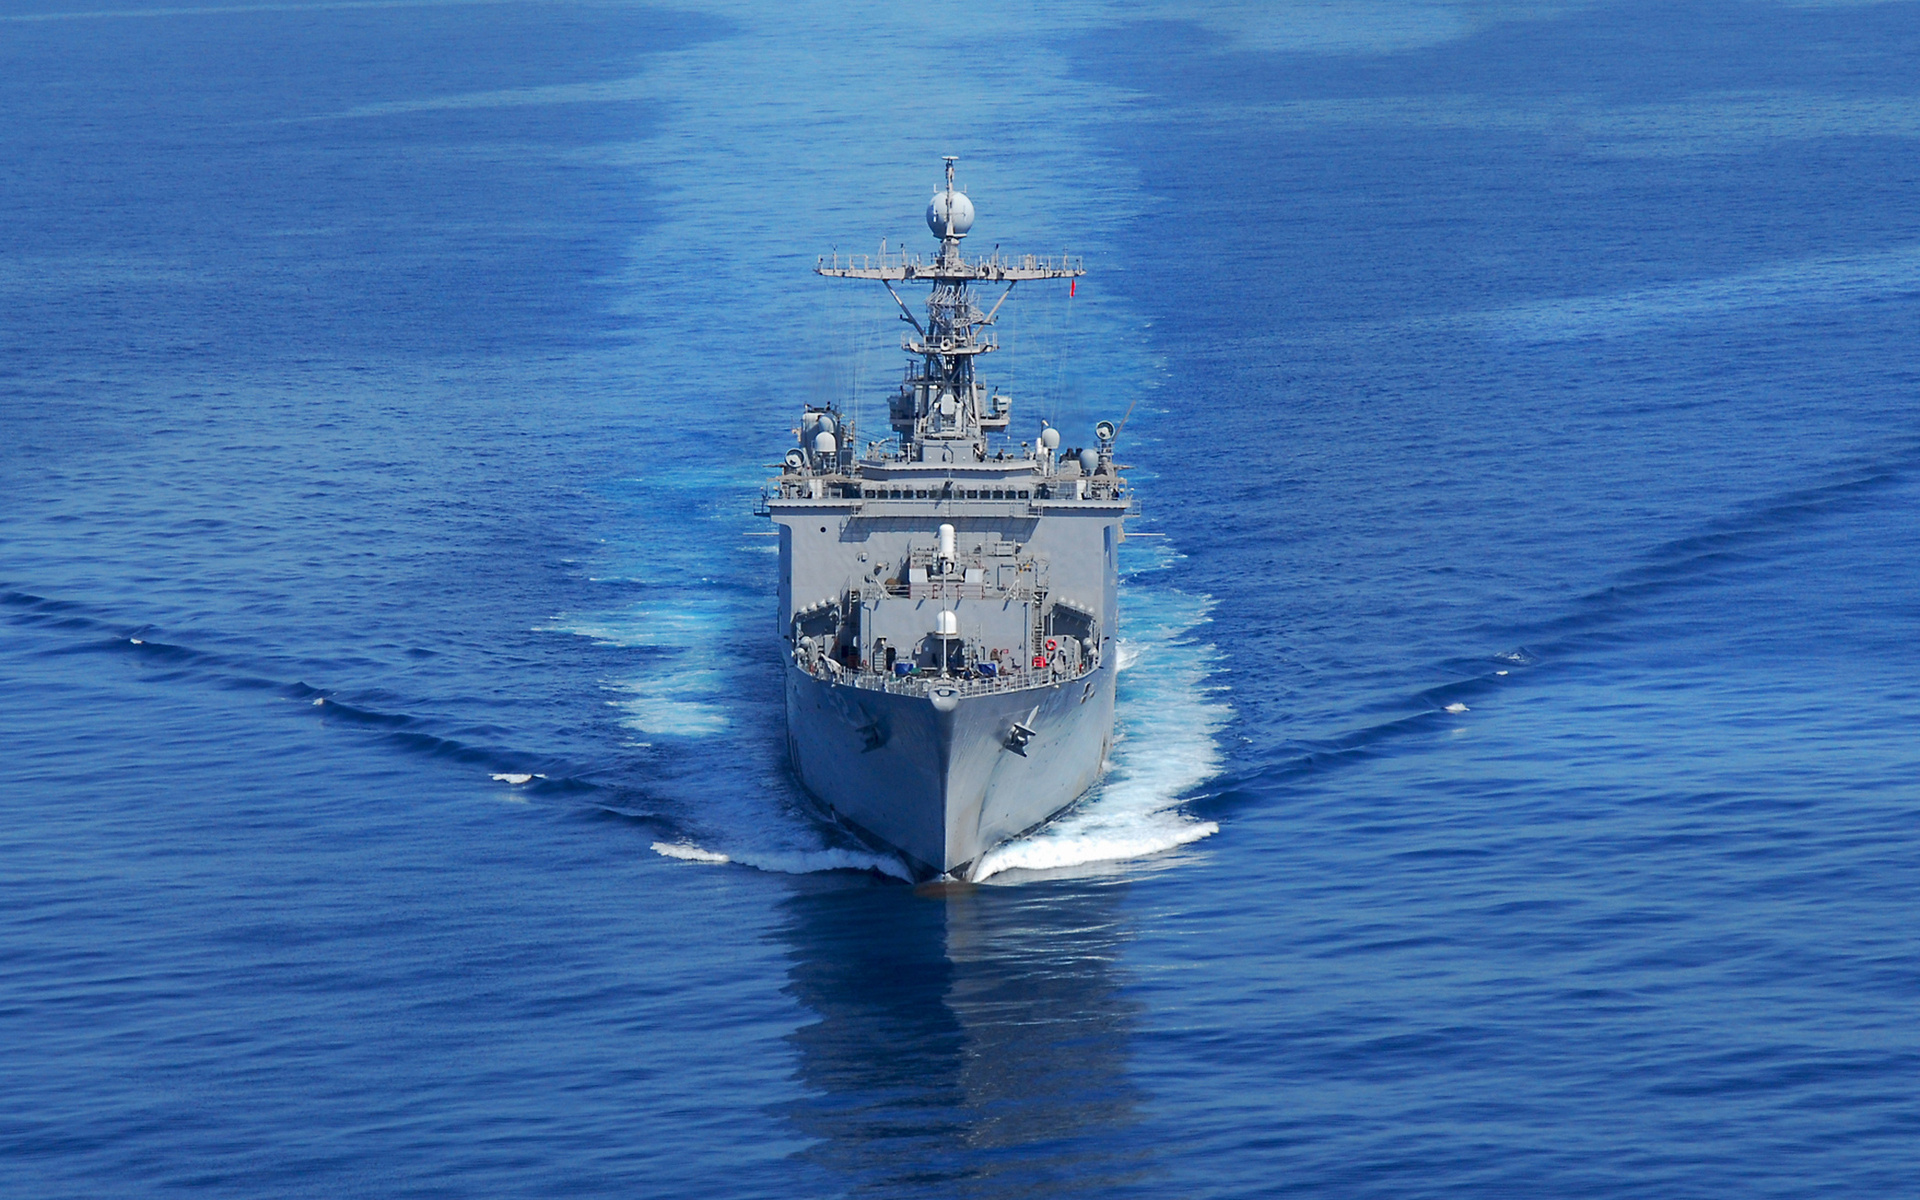 корабль, крейсер, море